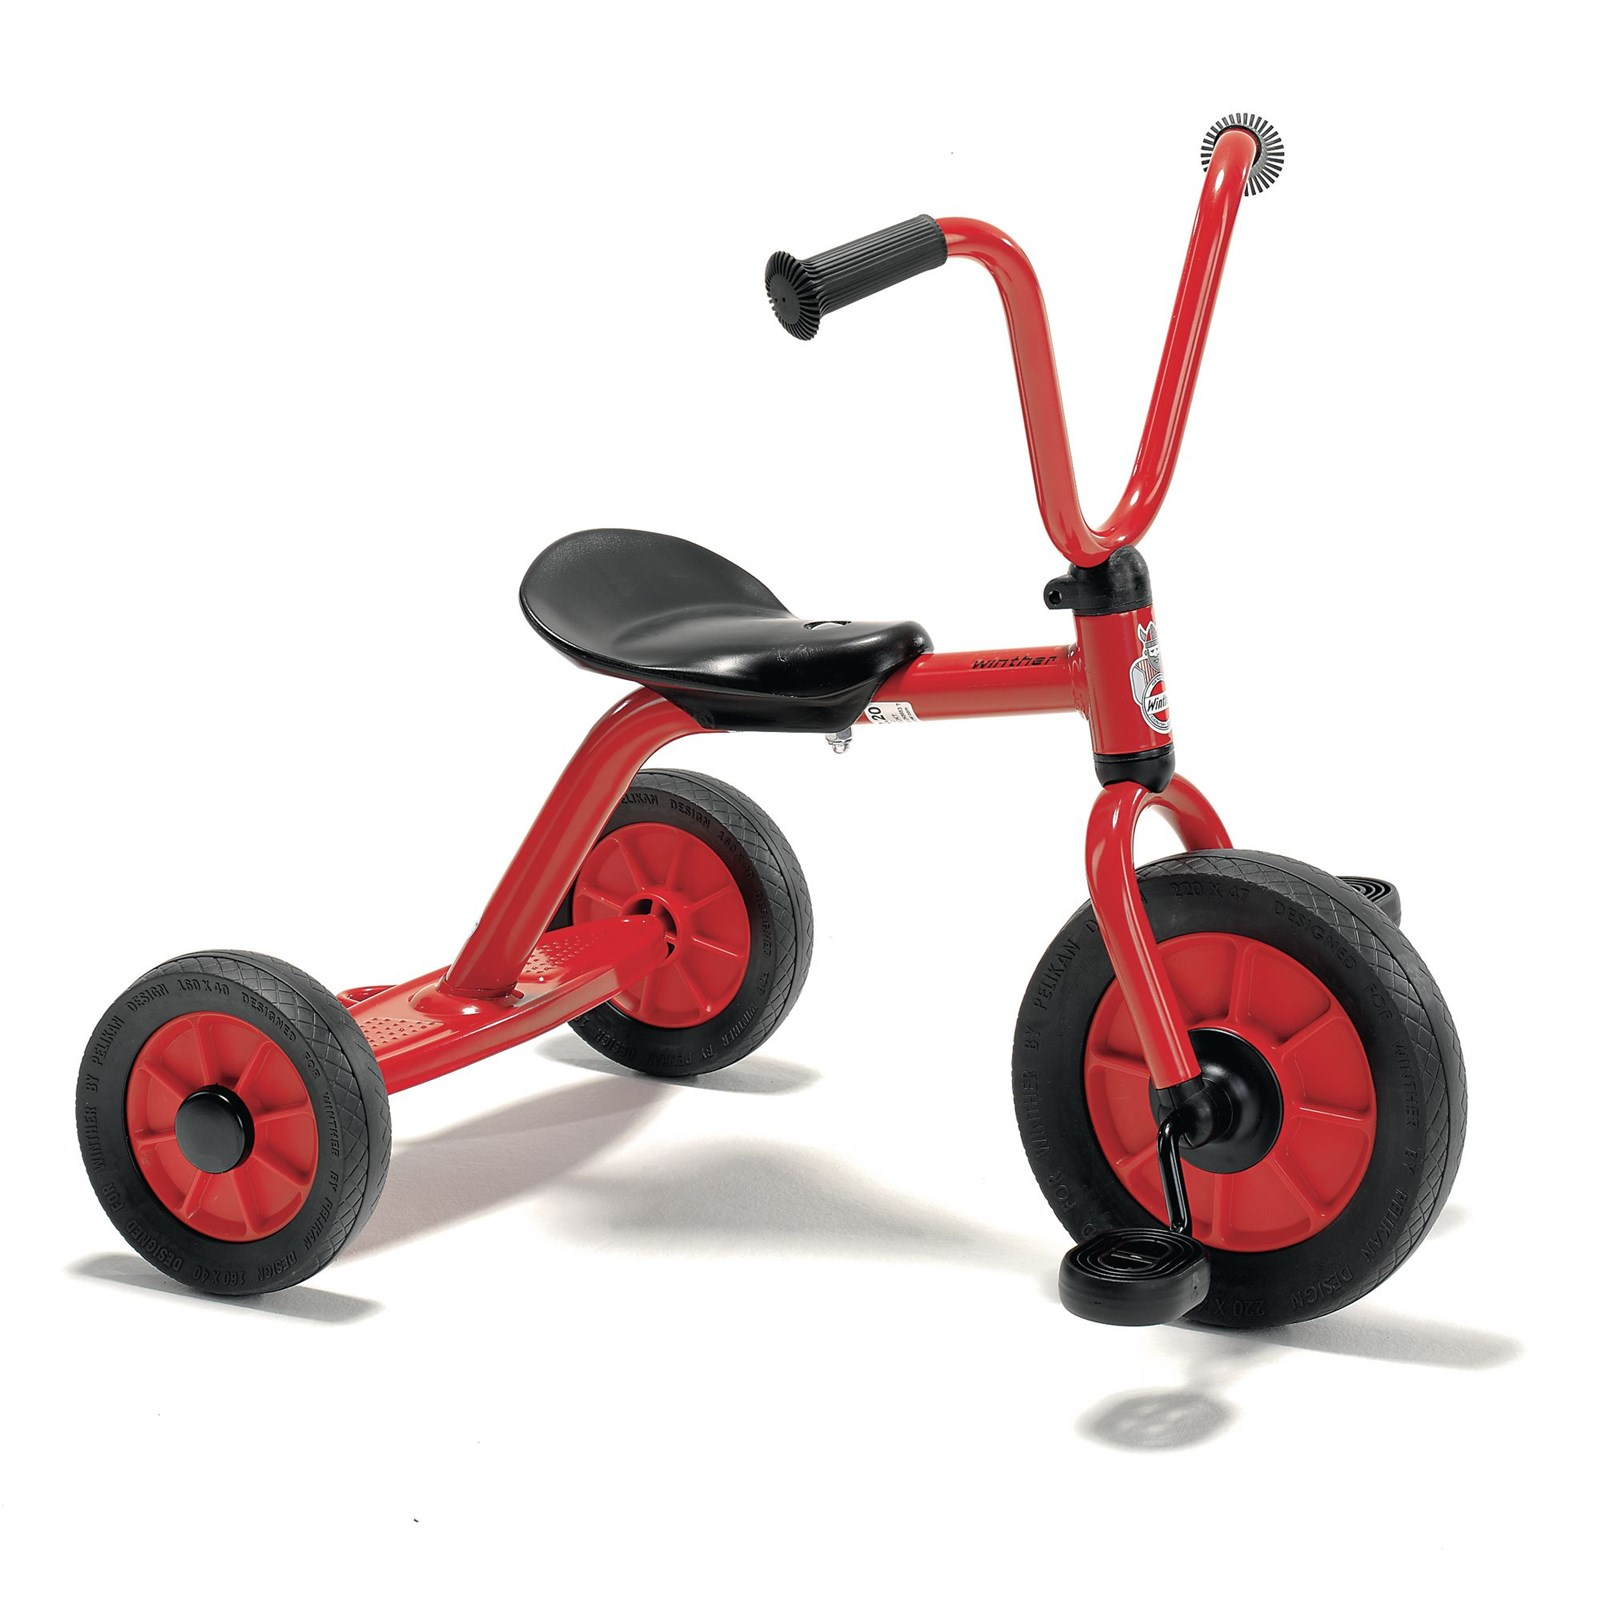 Winther Piggy Back Trike